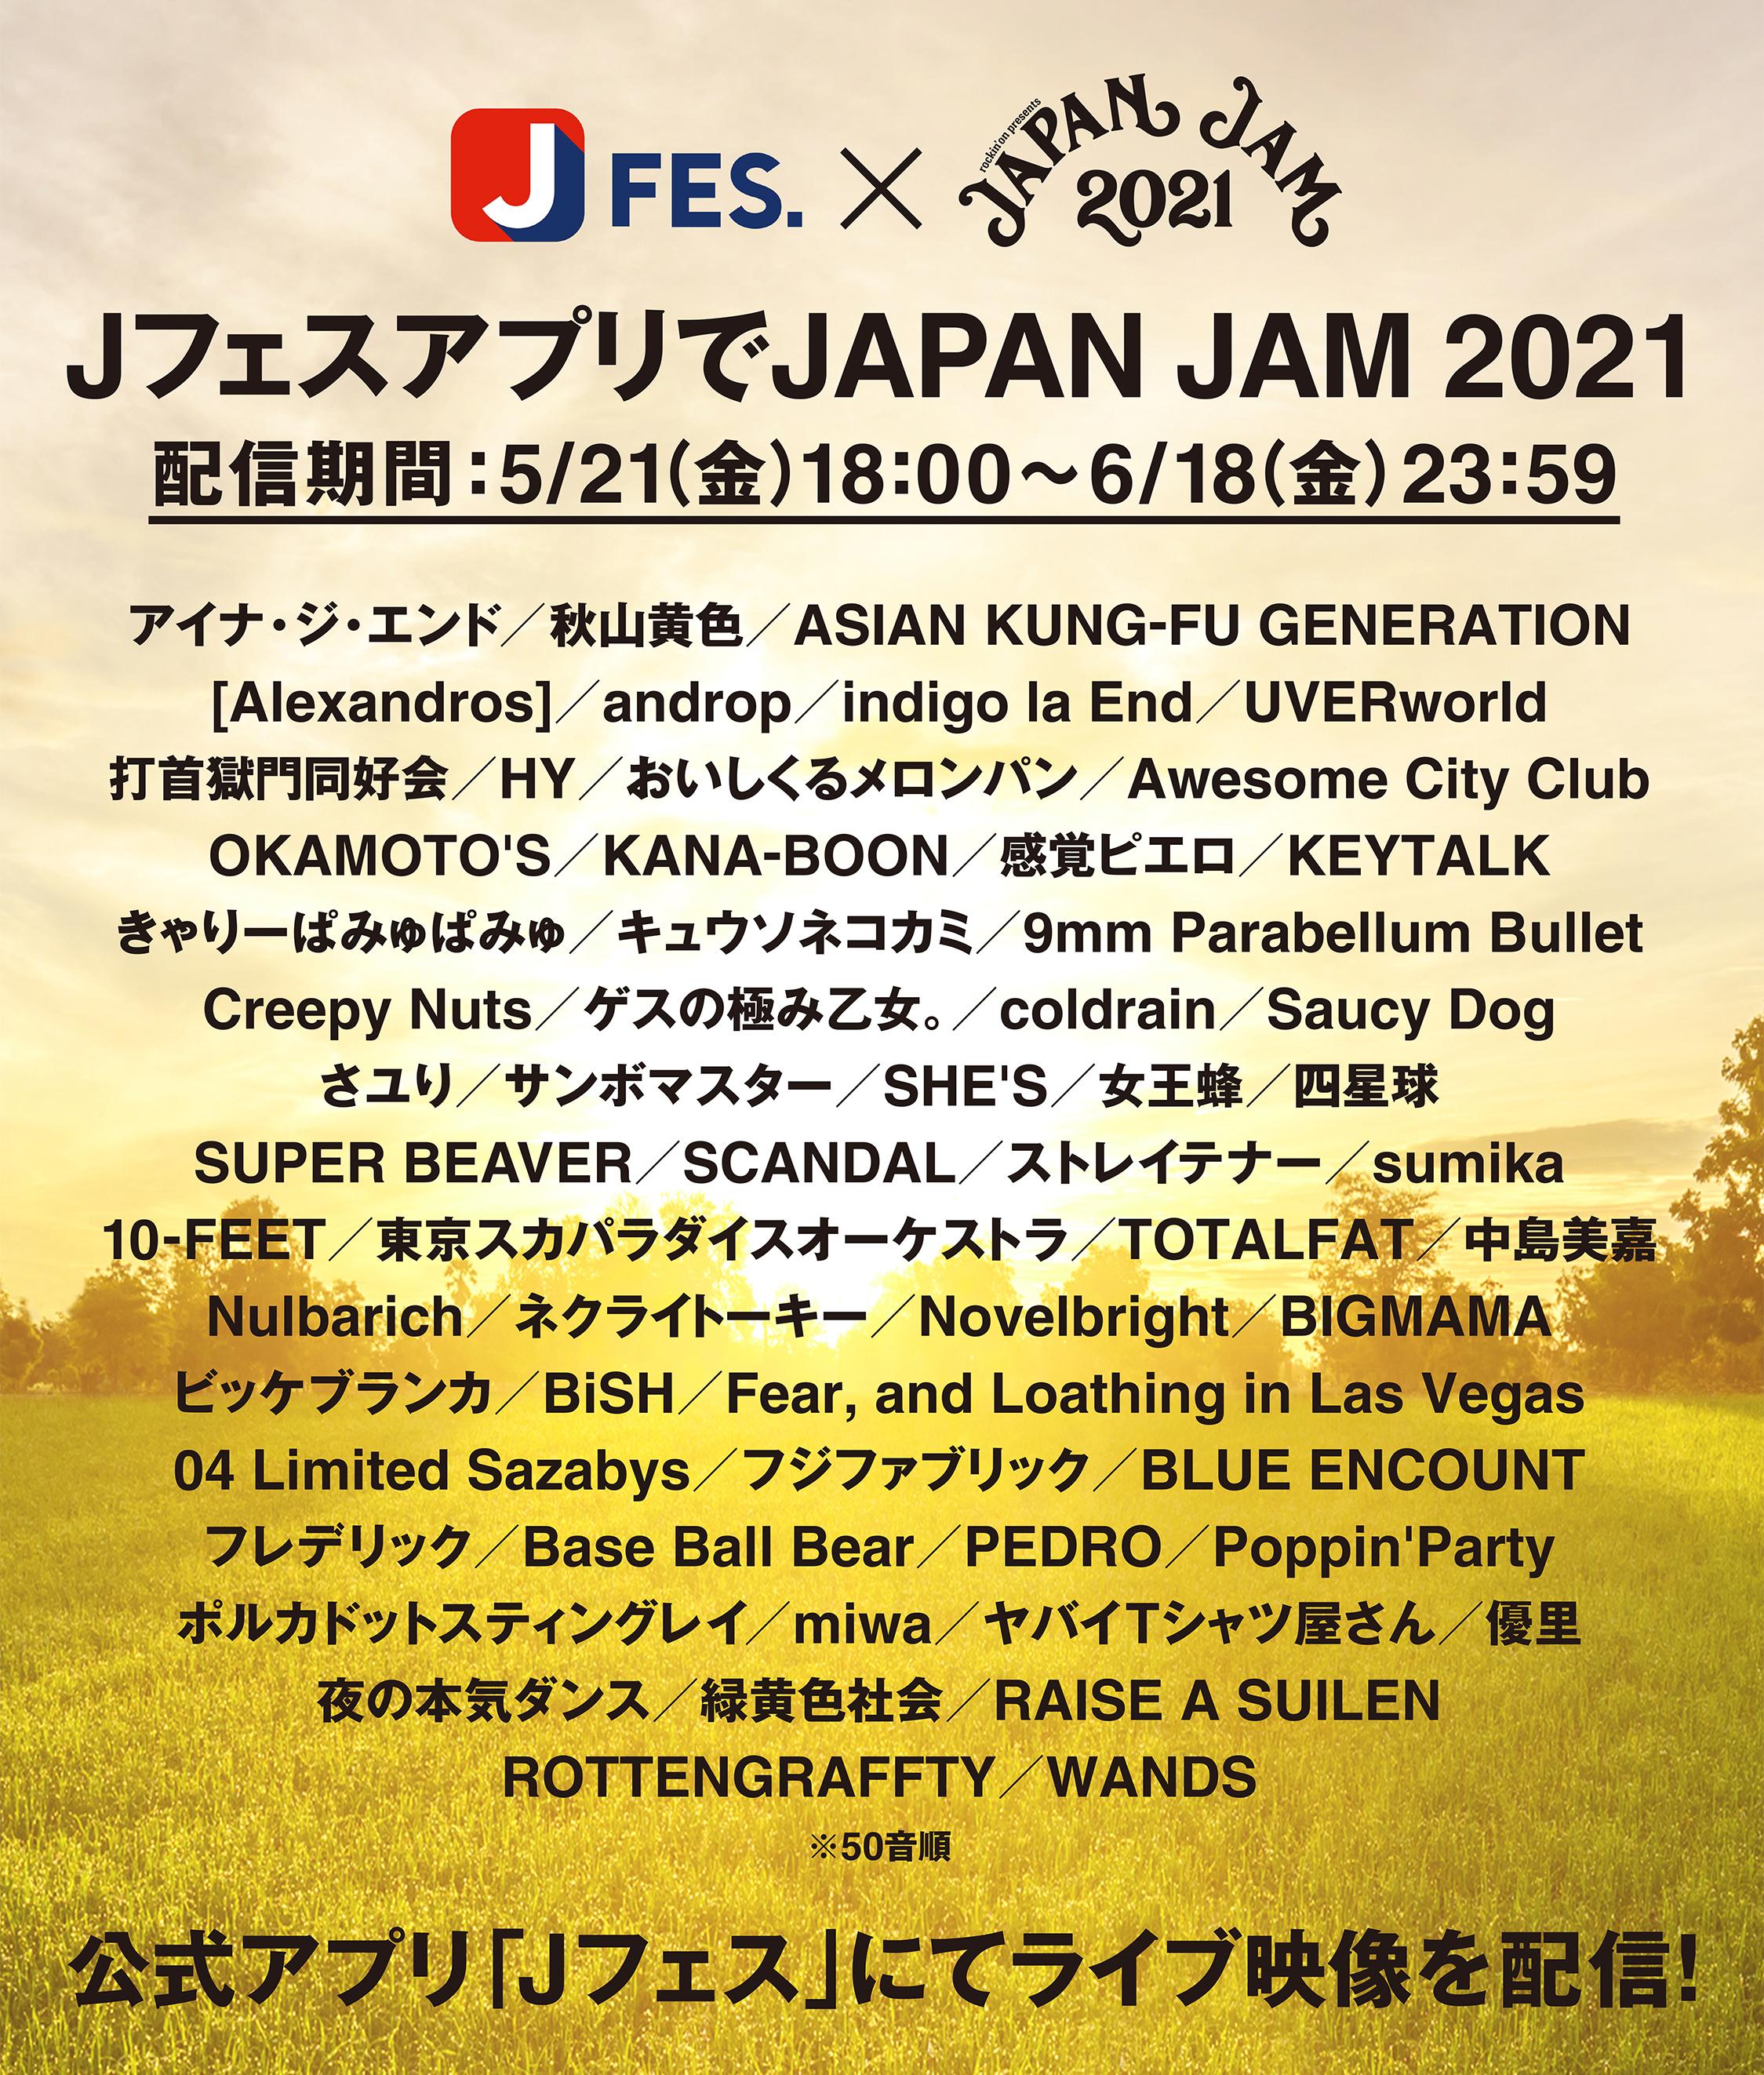 SCANDAL @ JAPAN JAM 2021 E1vSajpVgAINUGn?format=jpg&name=4096x4096